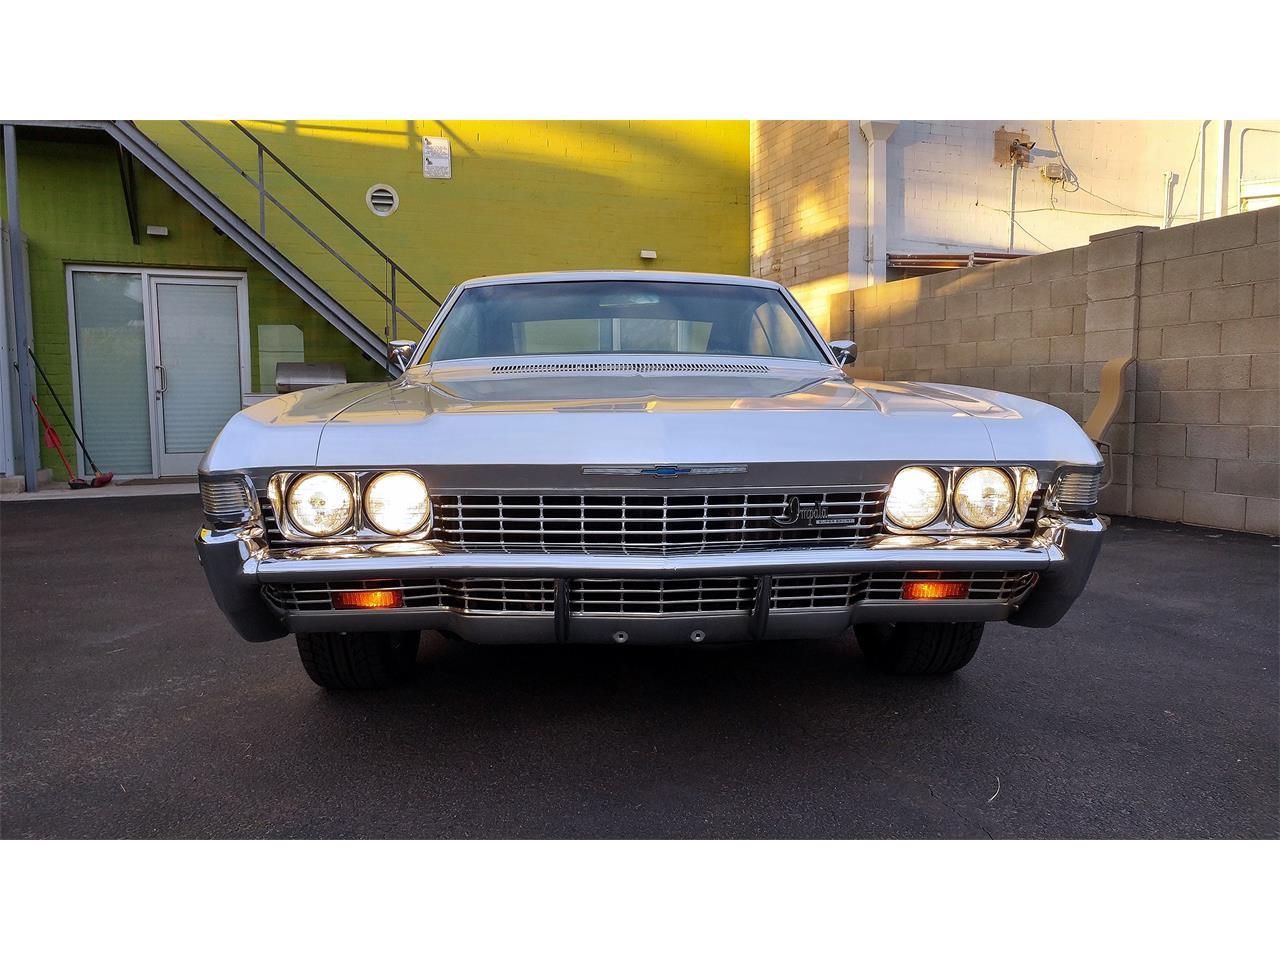 For Sale: 1968 Chevrolet Impala SS in Phoenix, Arizona